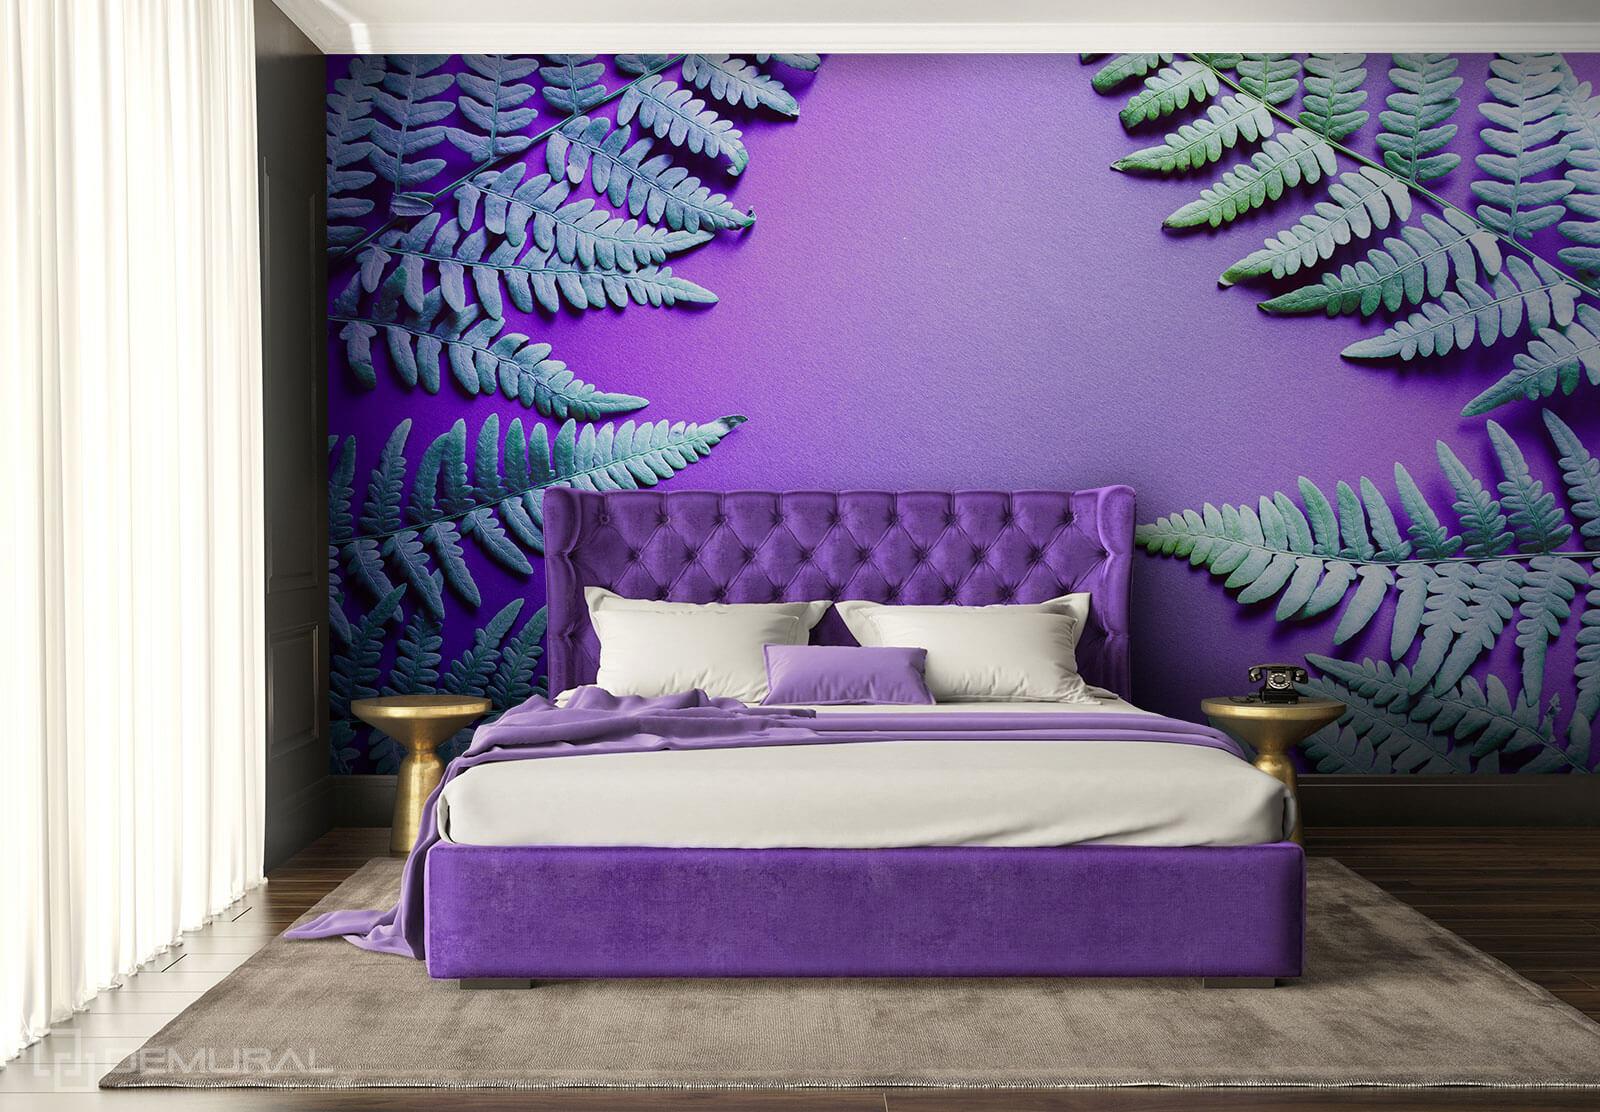 Photo wallpaper Fern flower - Ultraviolet wallpaper - Demural